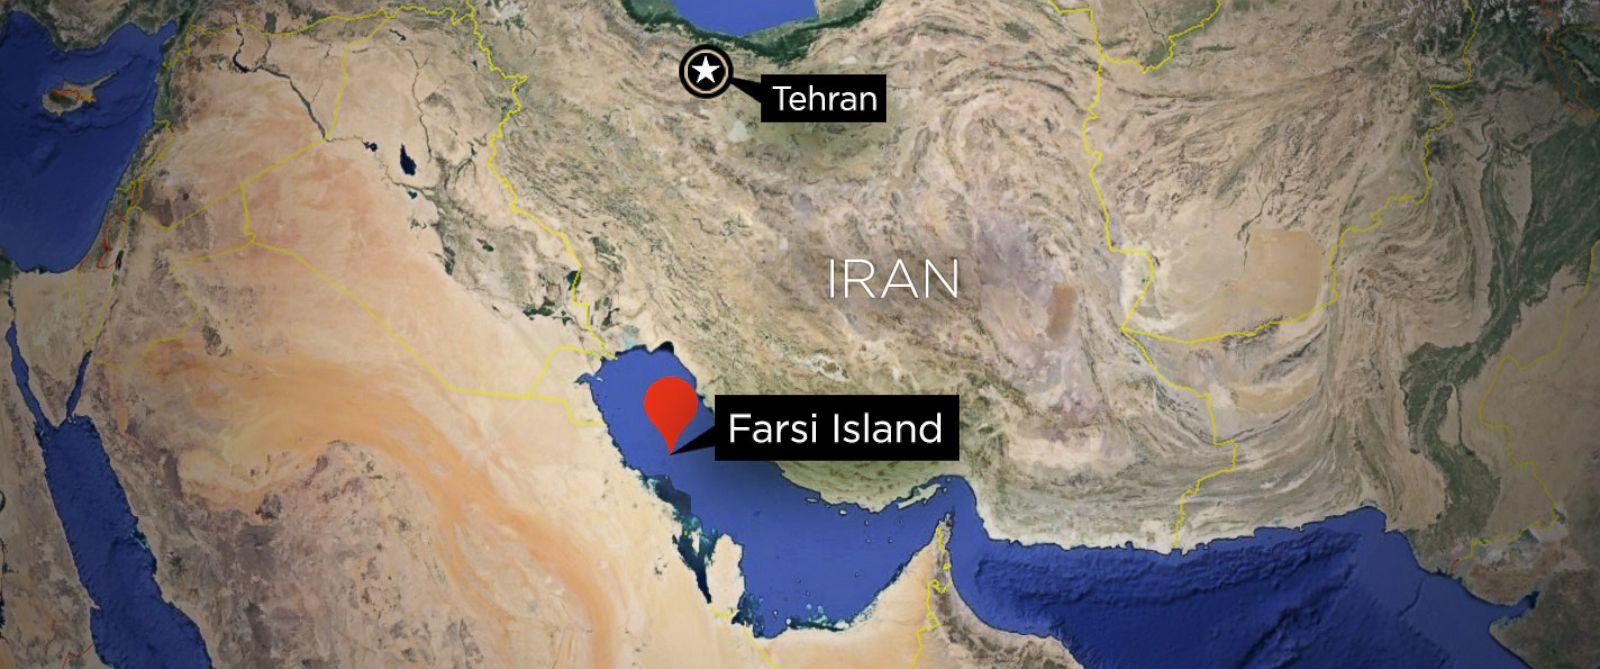 Farsi Island Map - ABC News